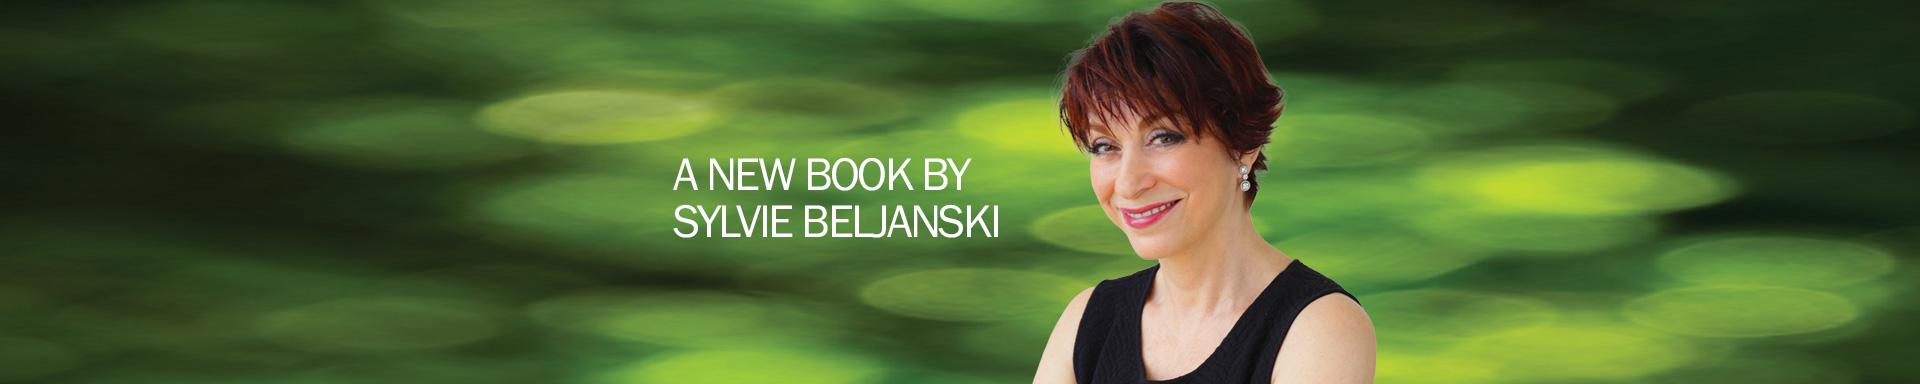 book-banner-sylvie2